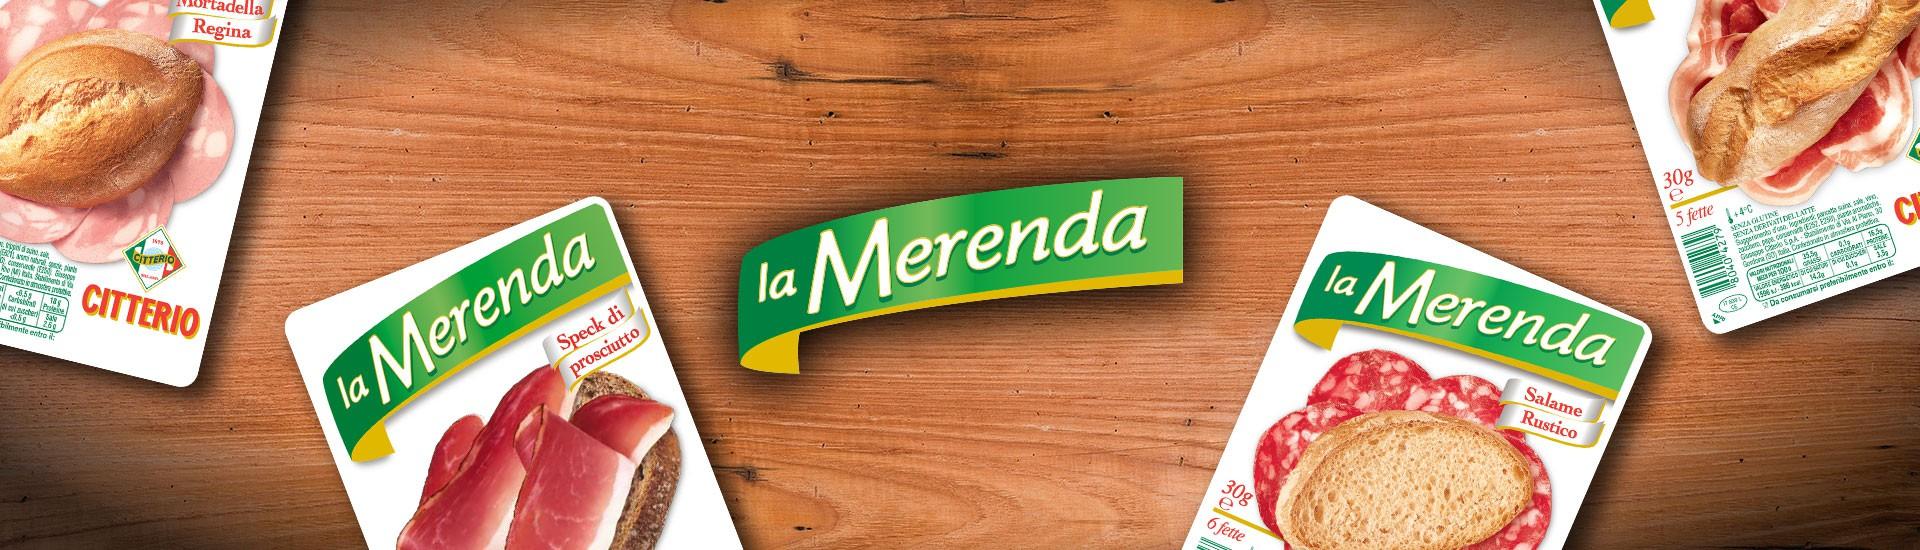 cover-merendaAsWzID.jpg